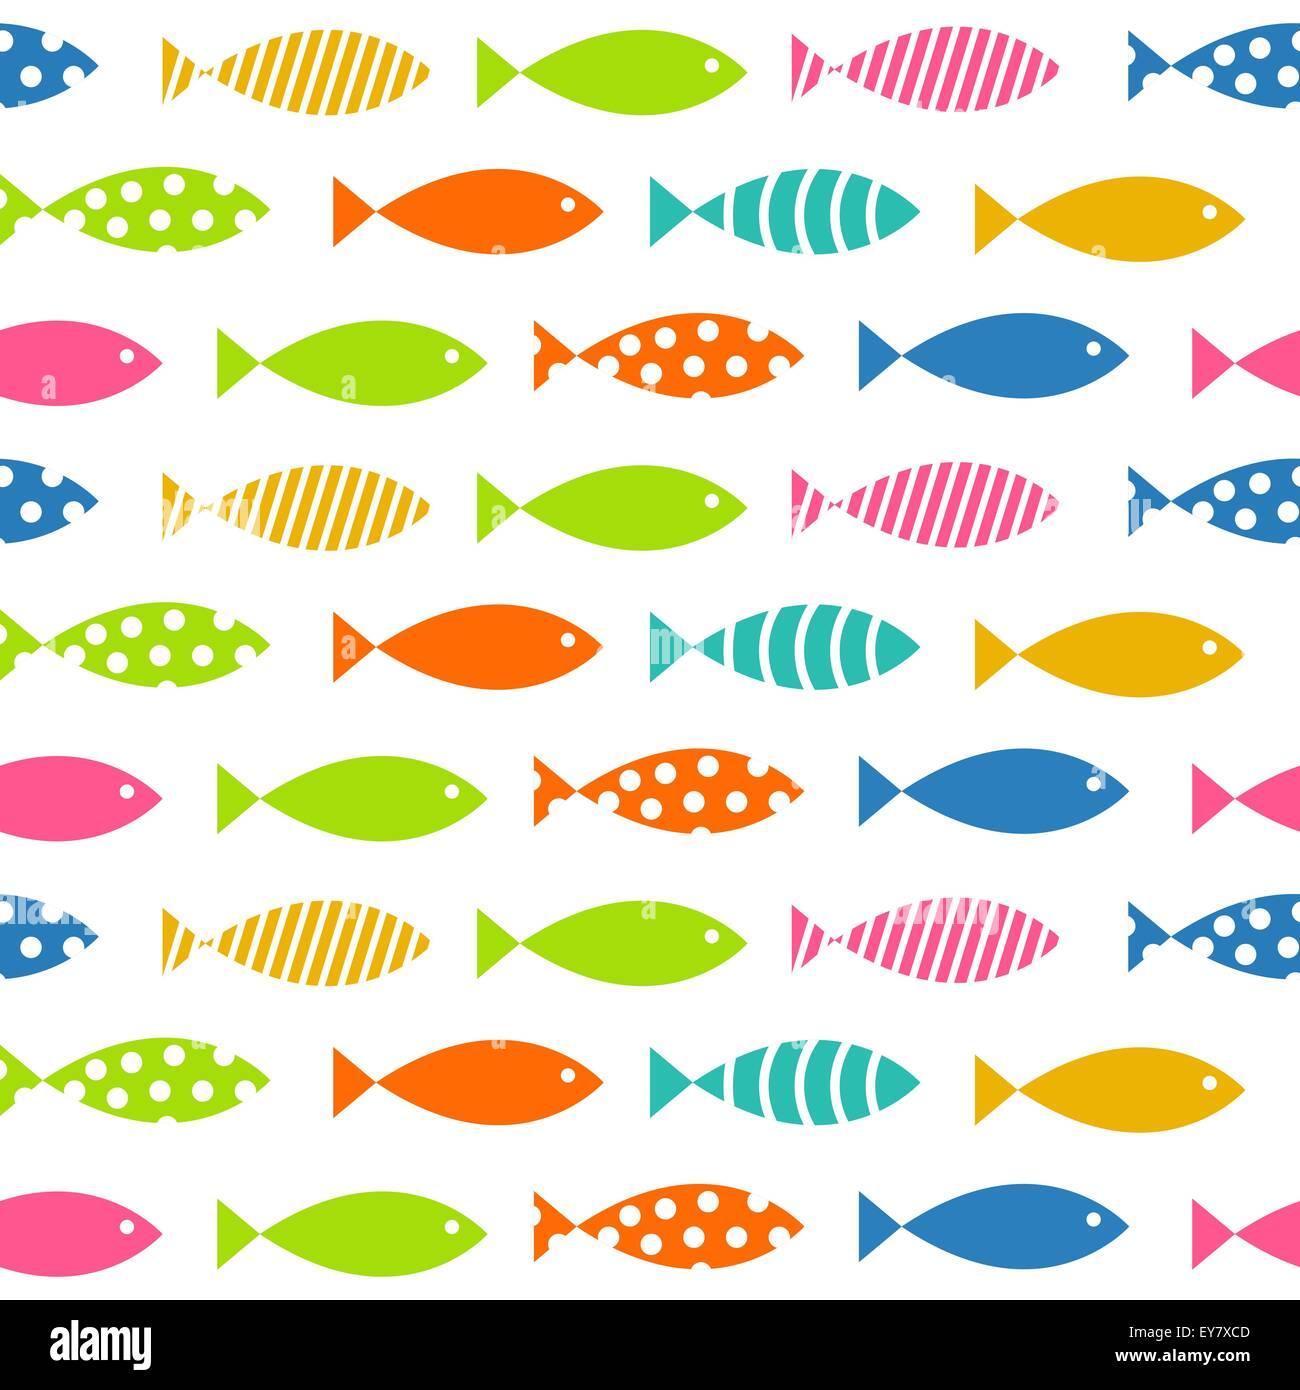 Mult Fish Seamless Pattern Background Vector Illustration - Stock Vector